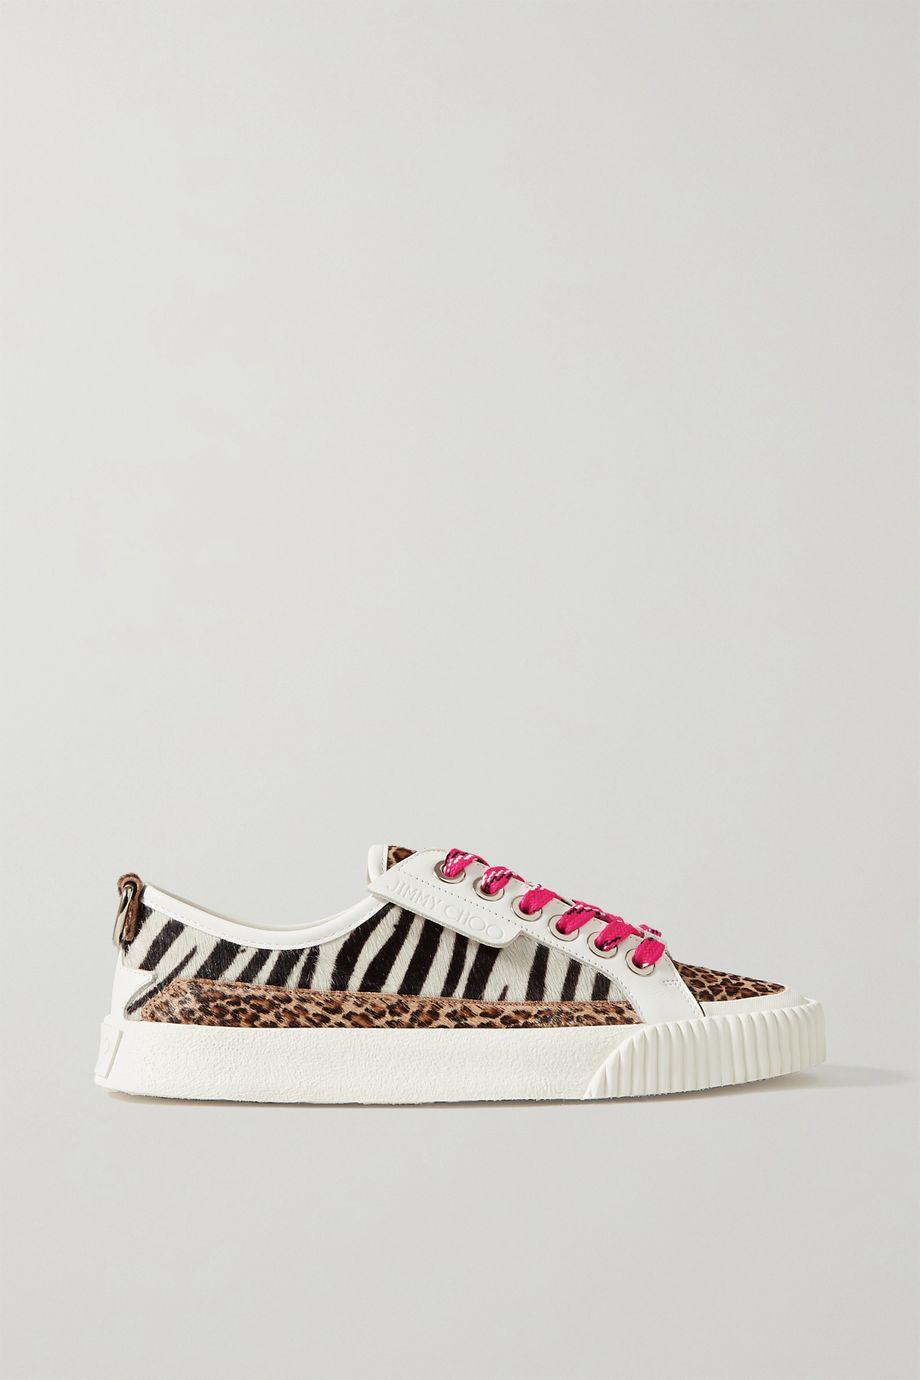 Jimmy Choo Impala leather and animal-print calf hair sneakers